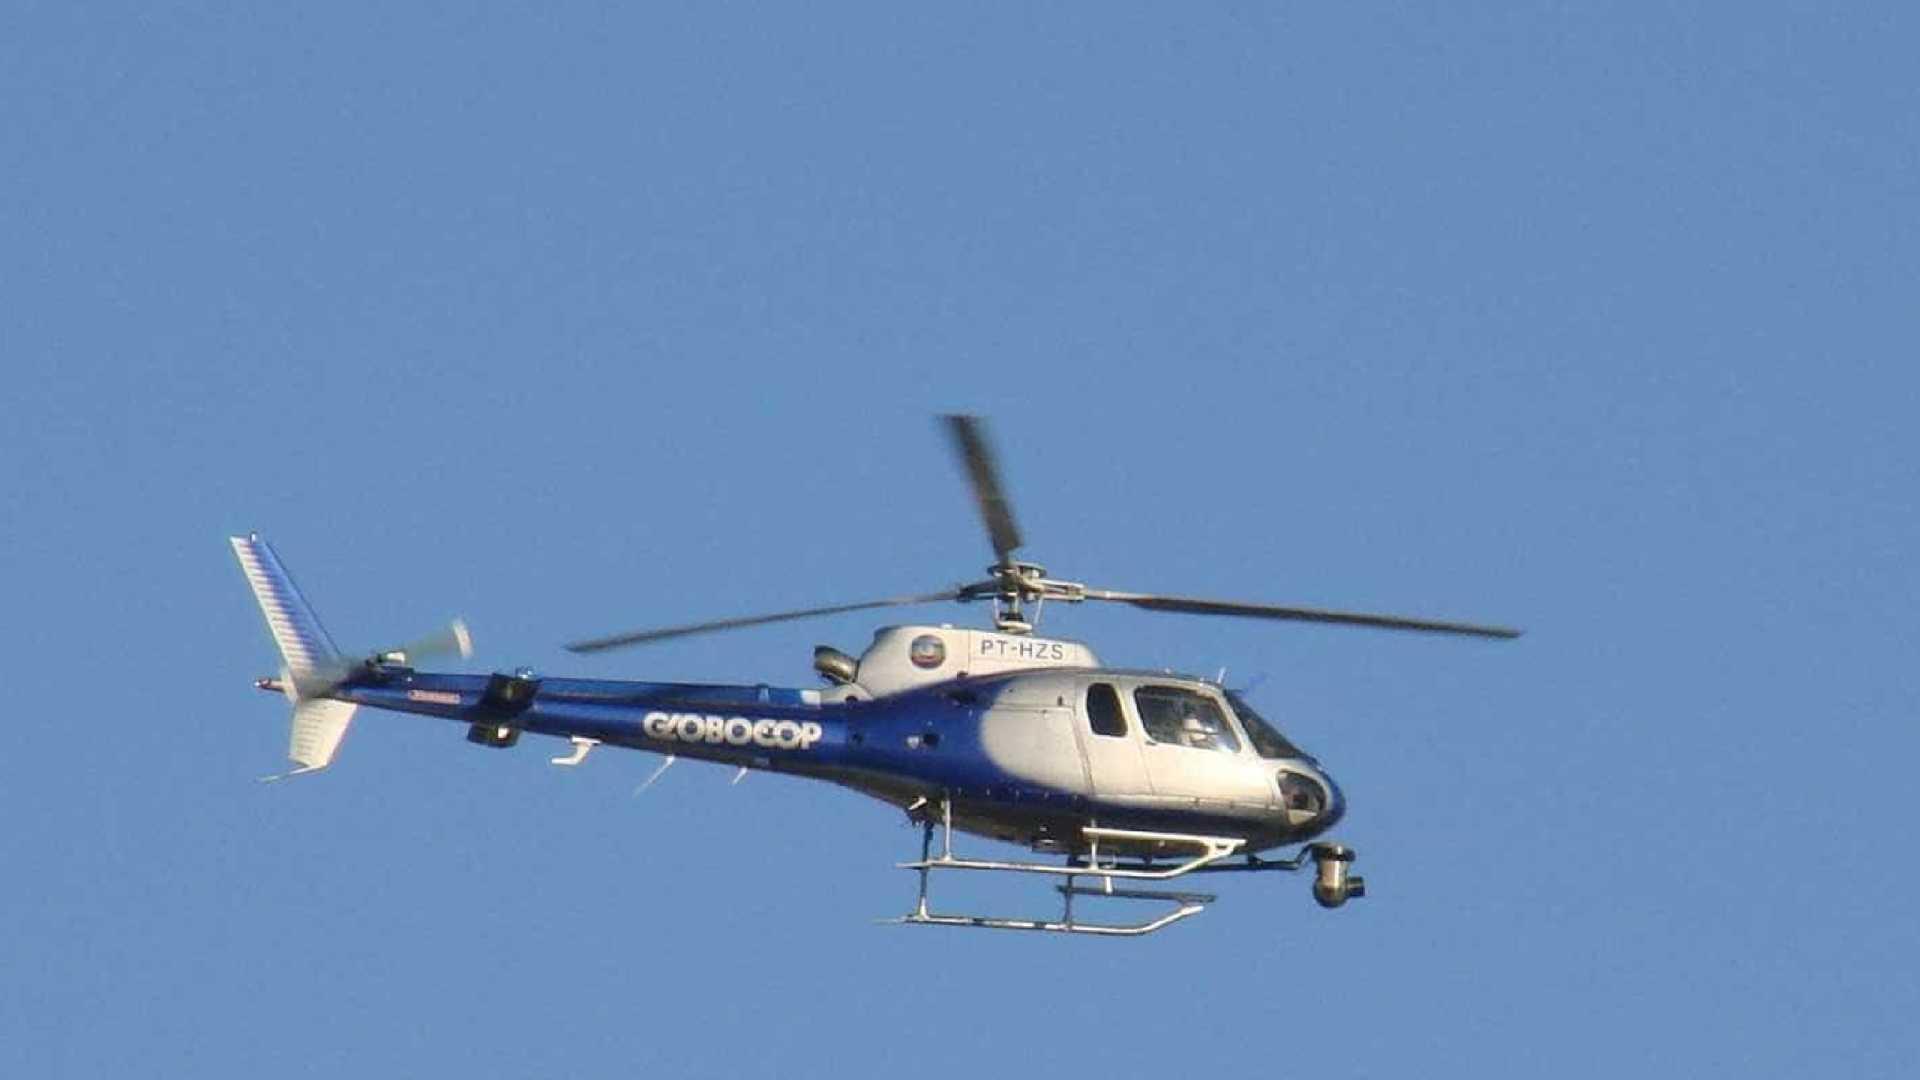 Helicóptero da Globo cai em praia e deixa ao menos 2 mortos